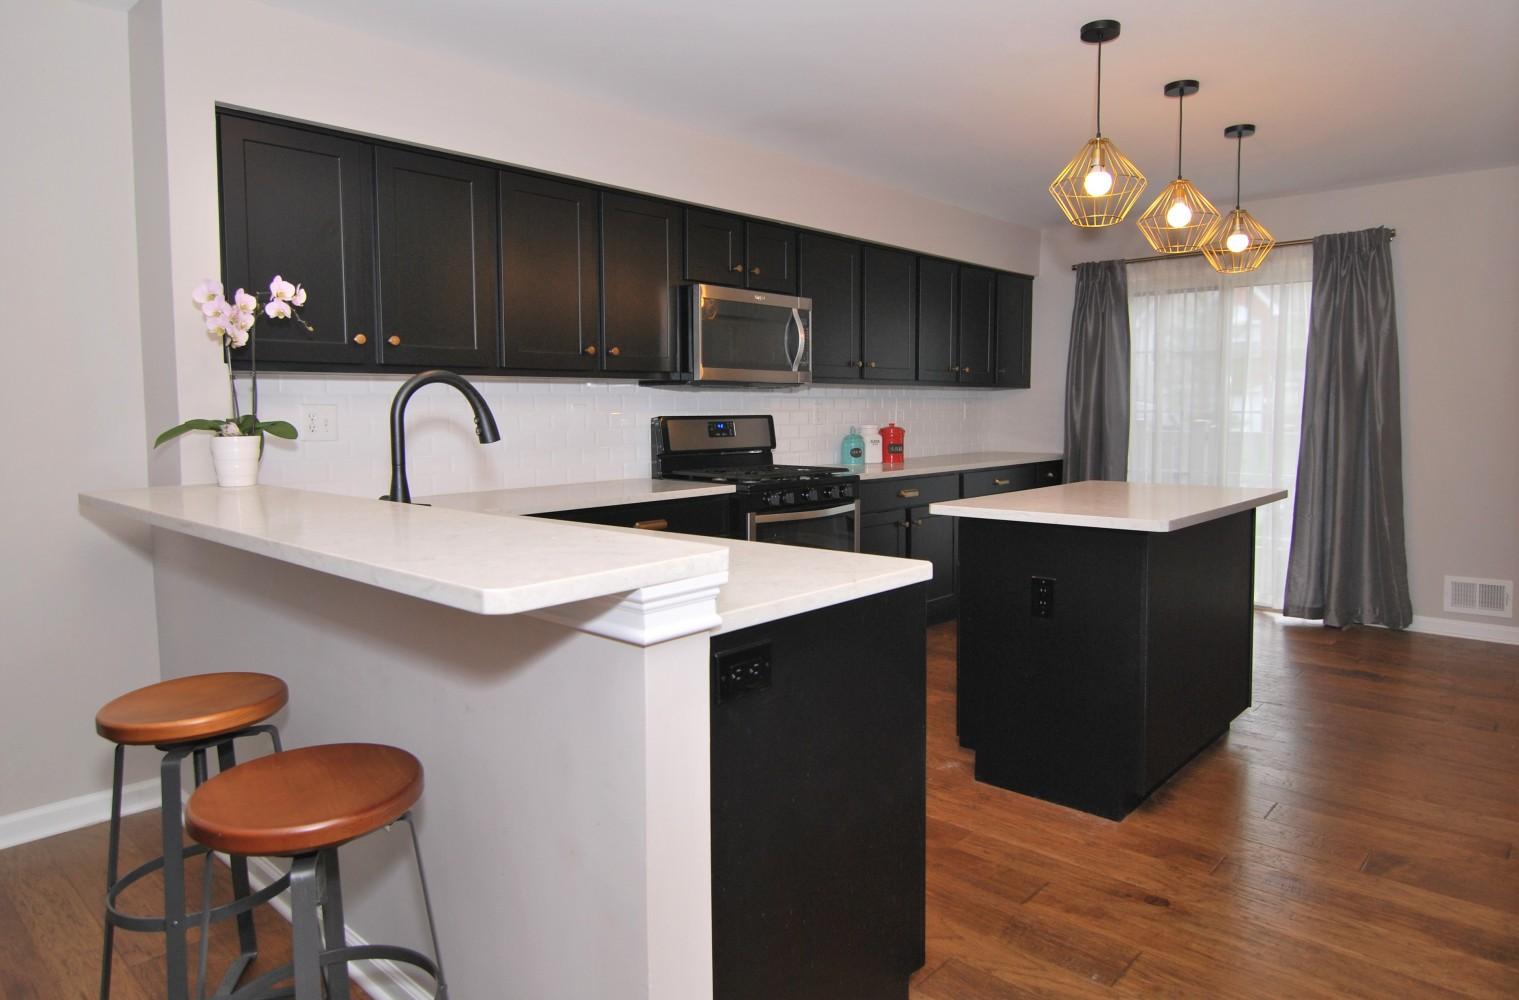 Black and white Asian style kitchen | Pennington NJ | Distinctive Interior Designs